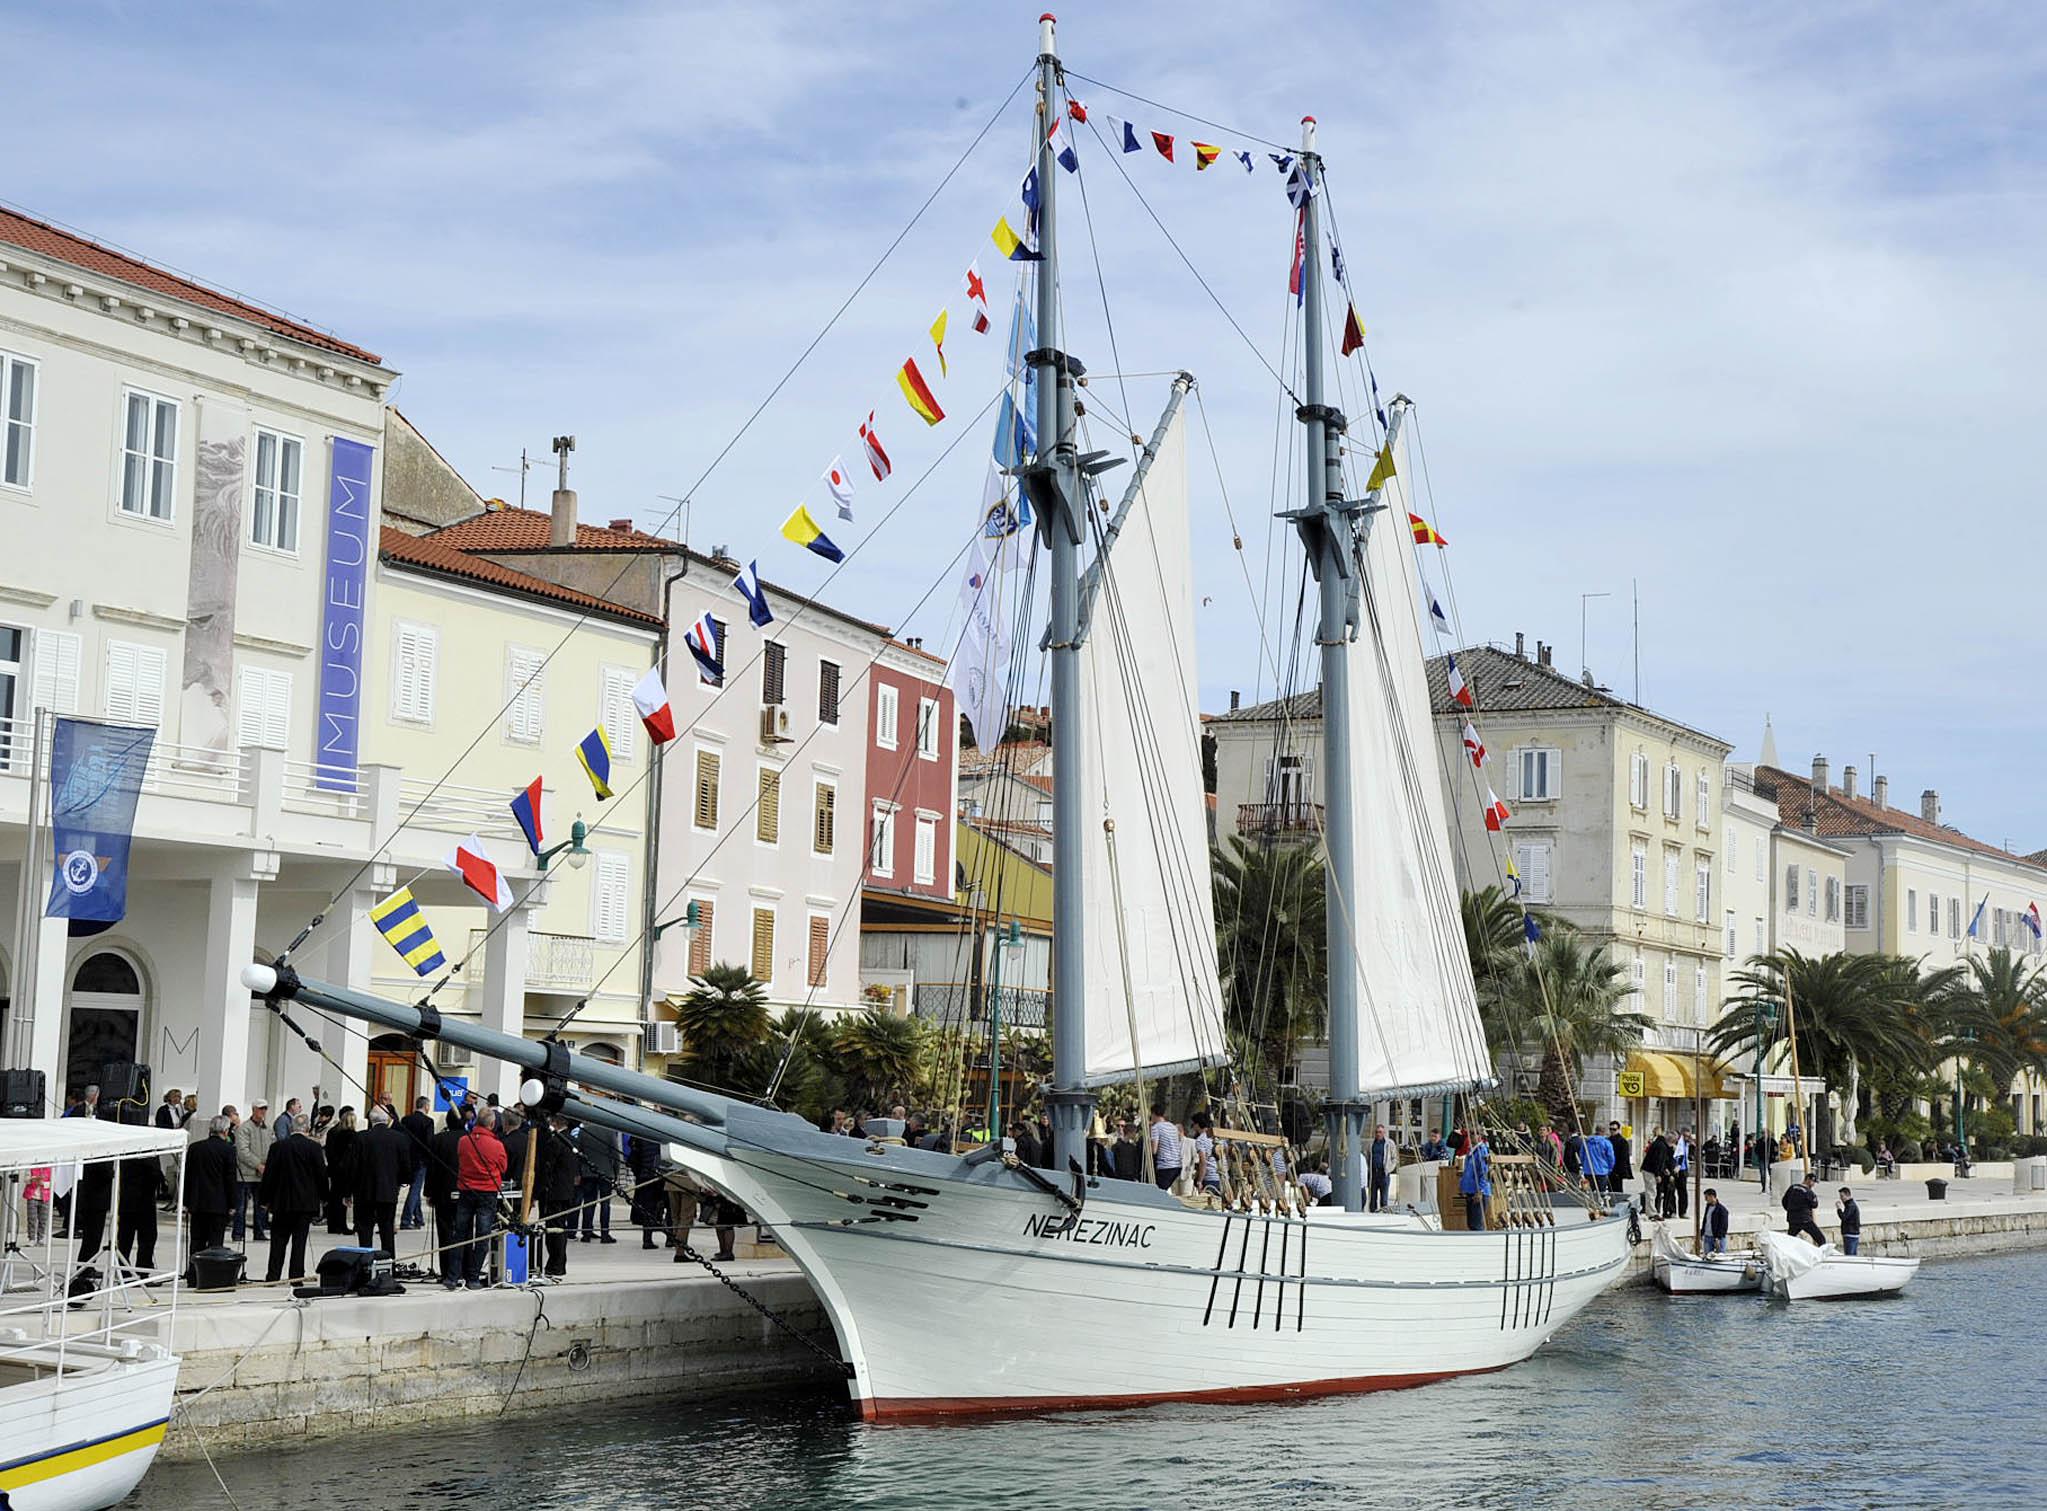 Jedrenjak Nerezinac obnovljen u sklopu projekta Mala barka 2 / Foto  S. DRECHSLER